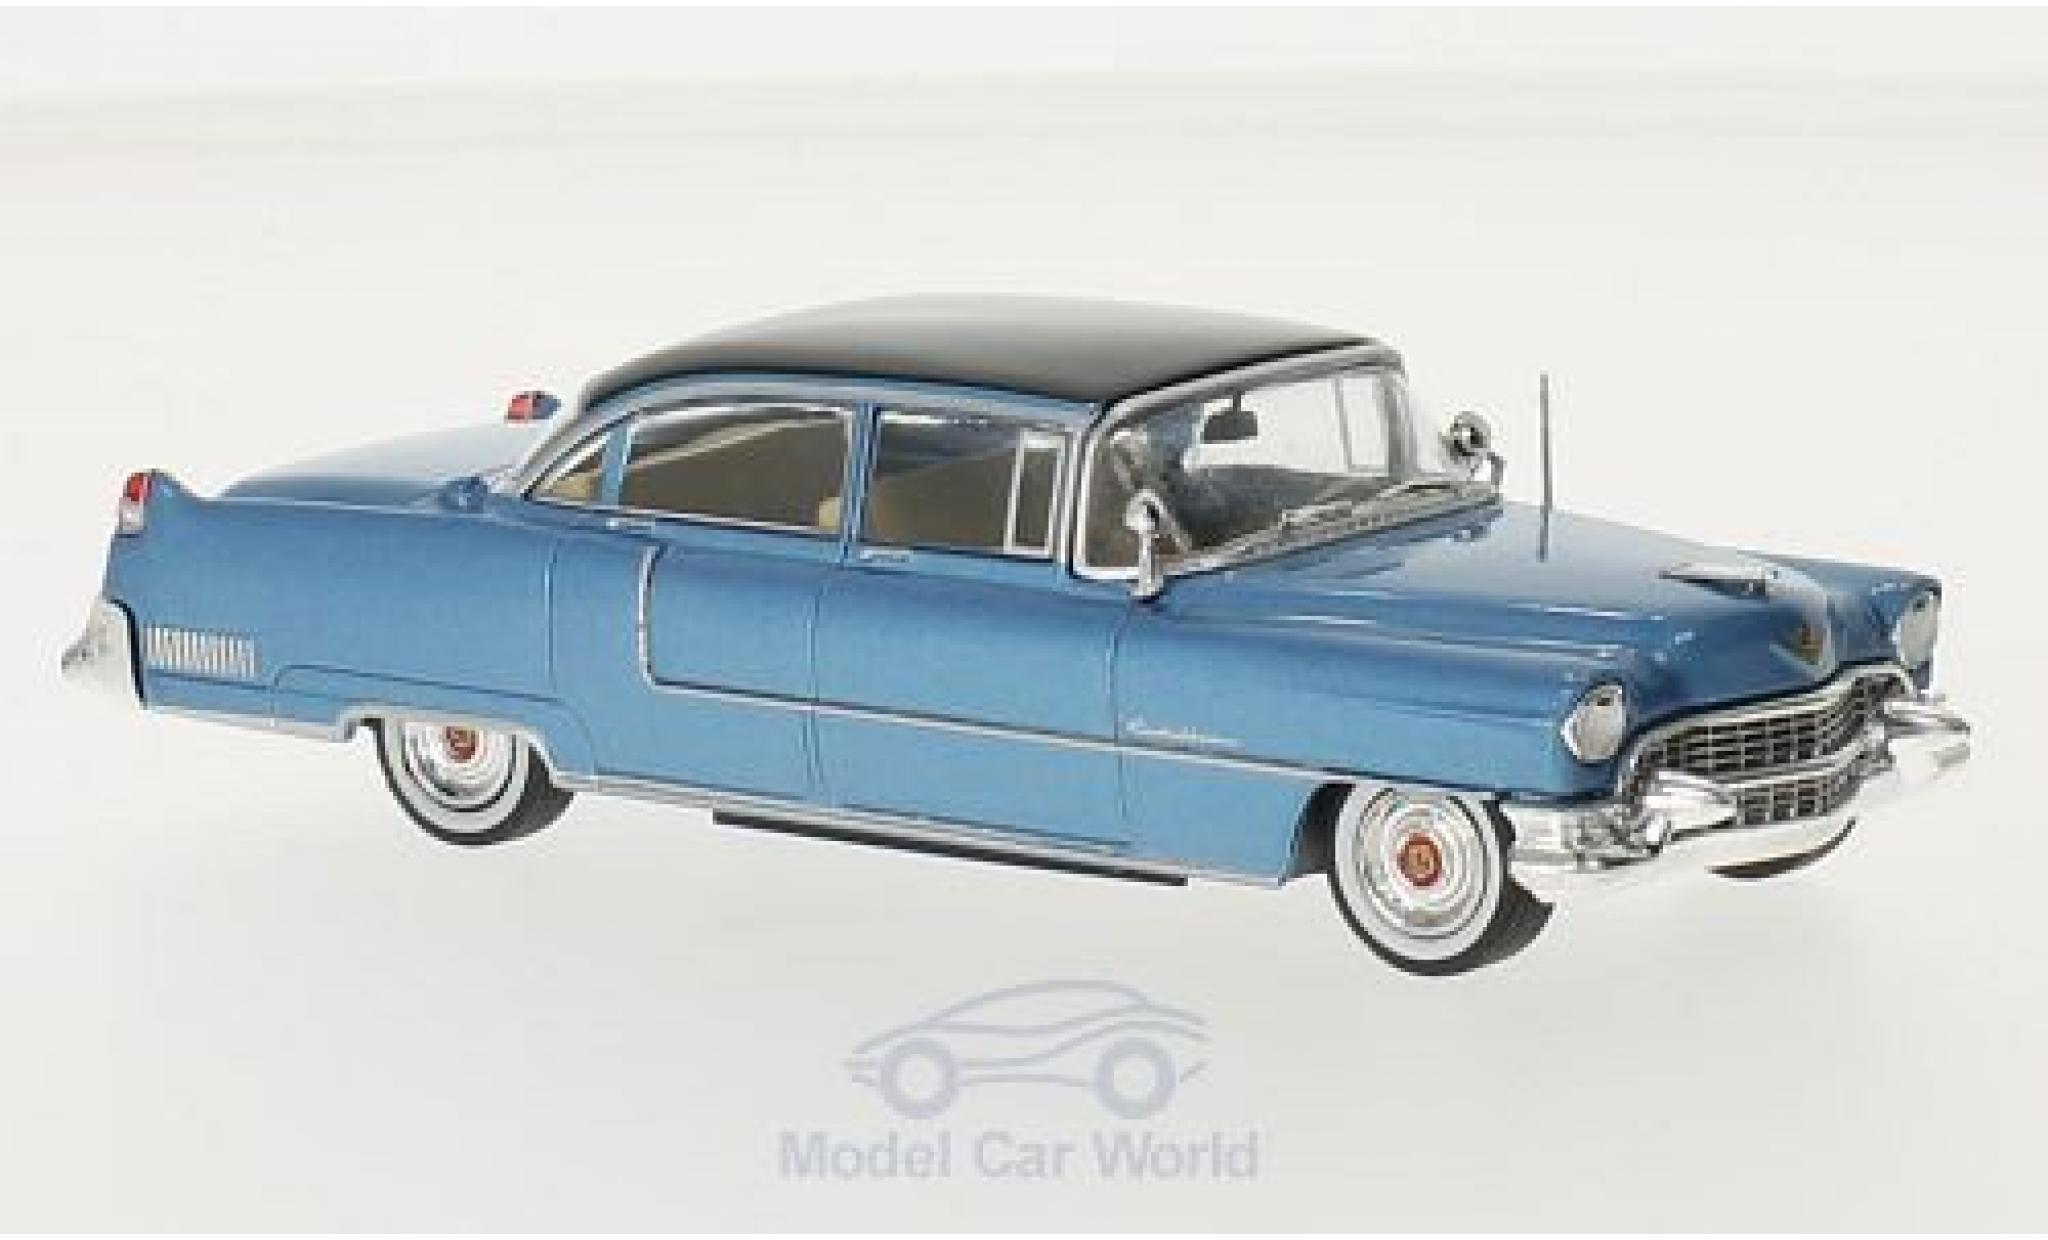 Cadillac Fleetwood 1/43 Greenlight Series 60 metallise blue Elvis Presley 1955